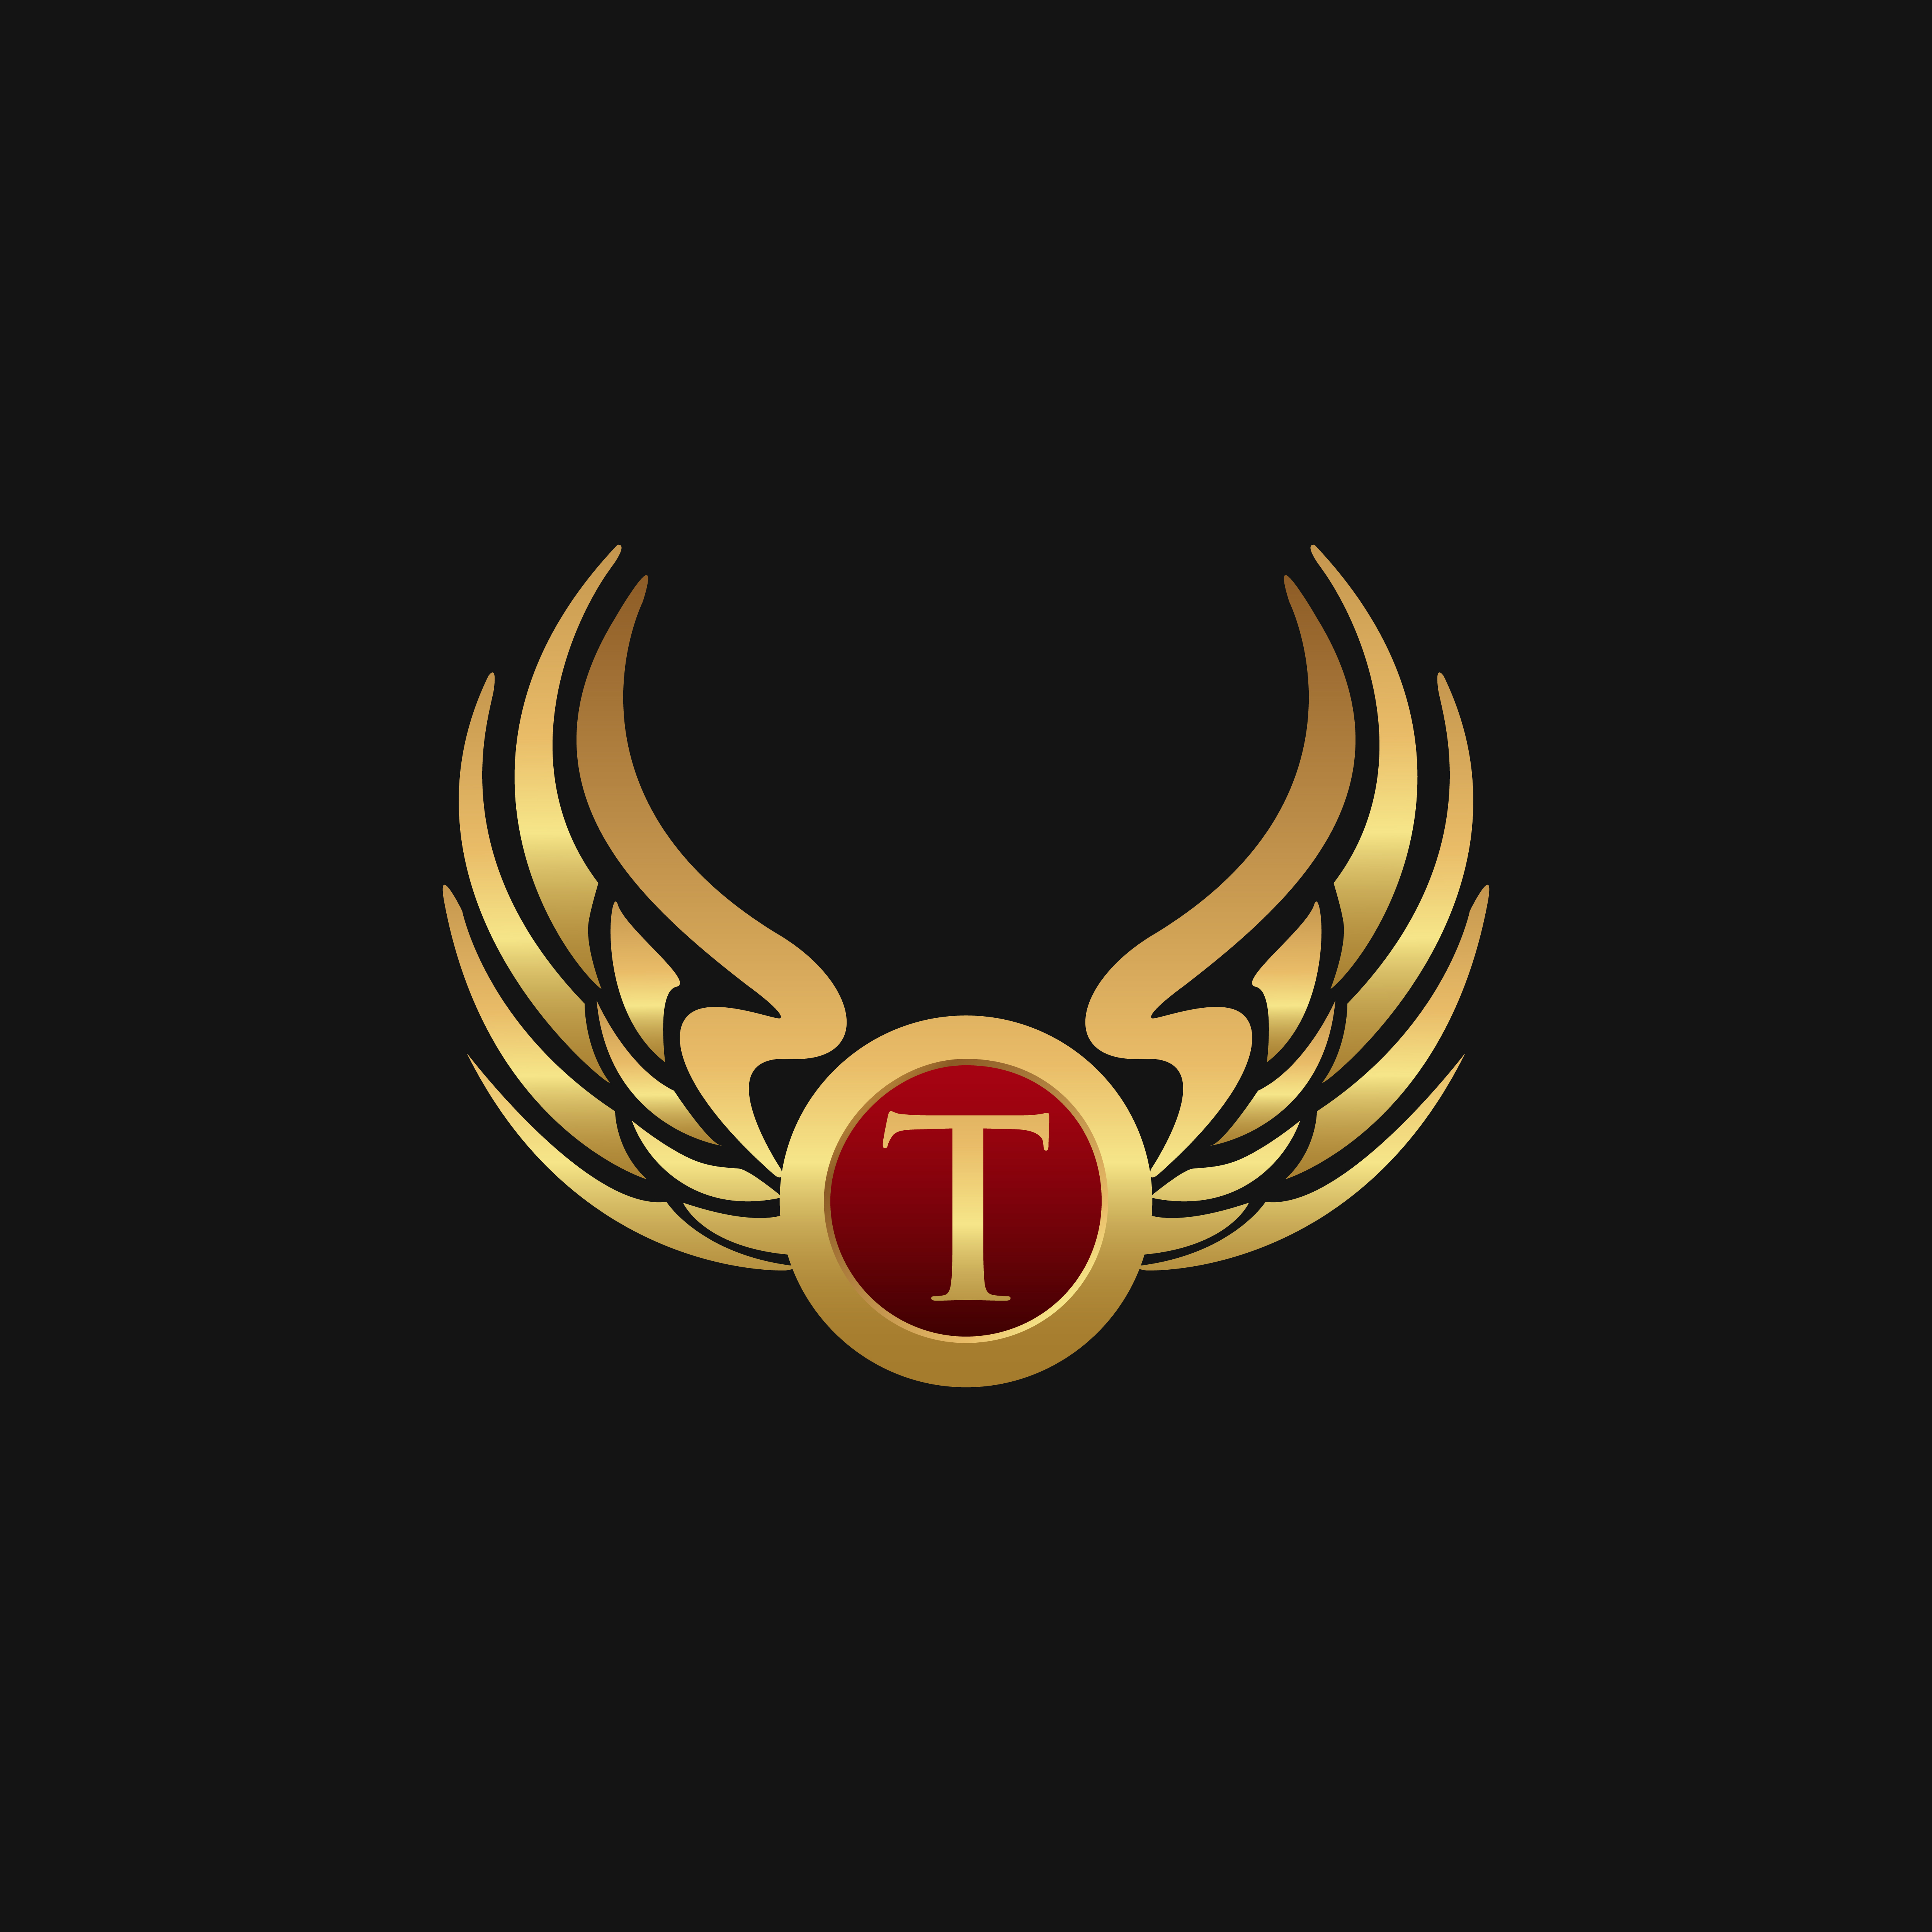 Luxury Letter T Emblem Wings Logo Design Concept Template